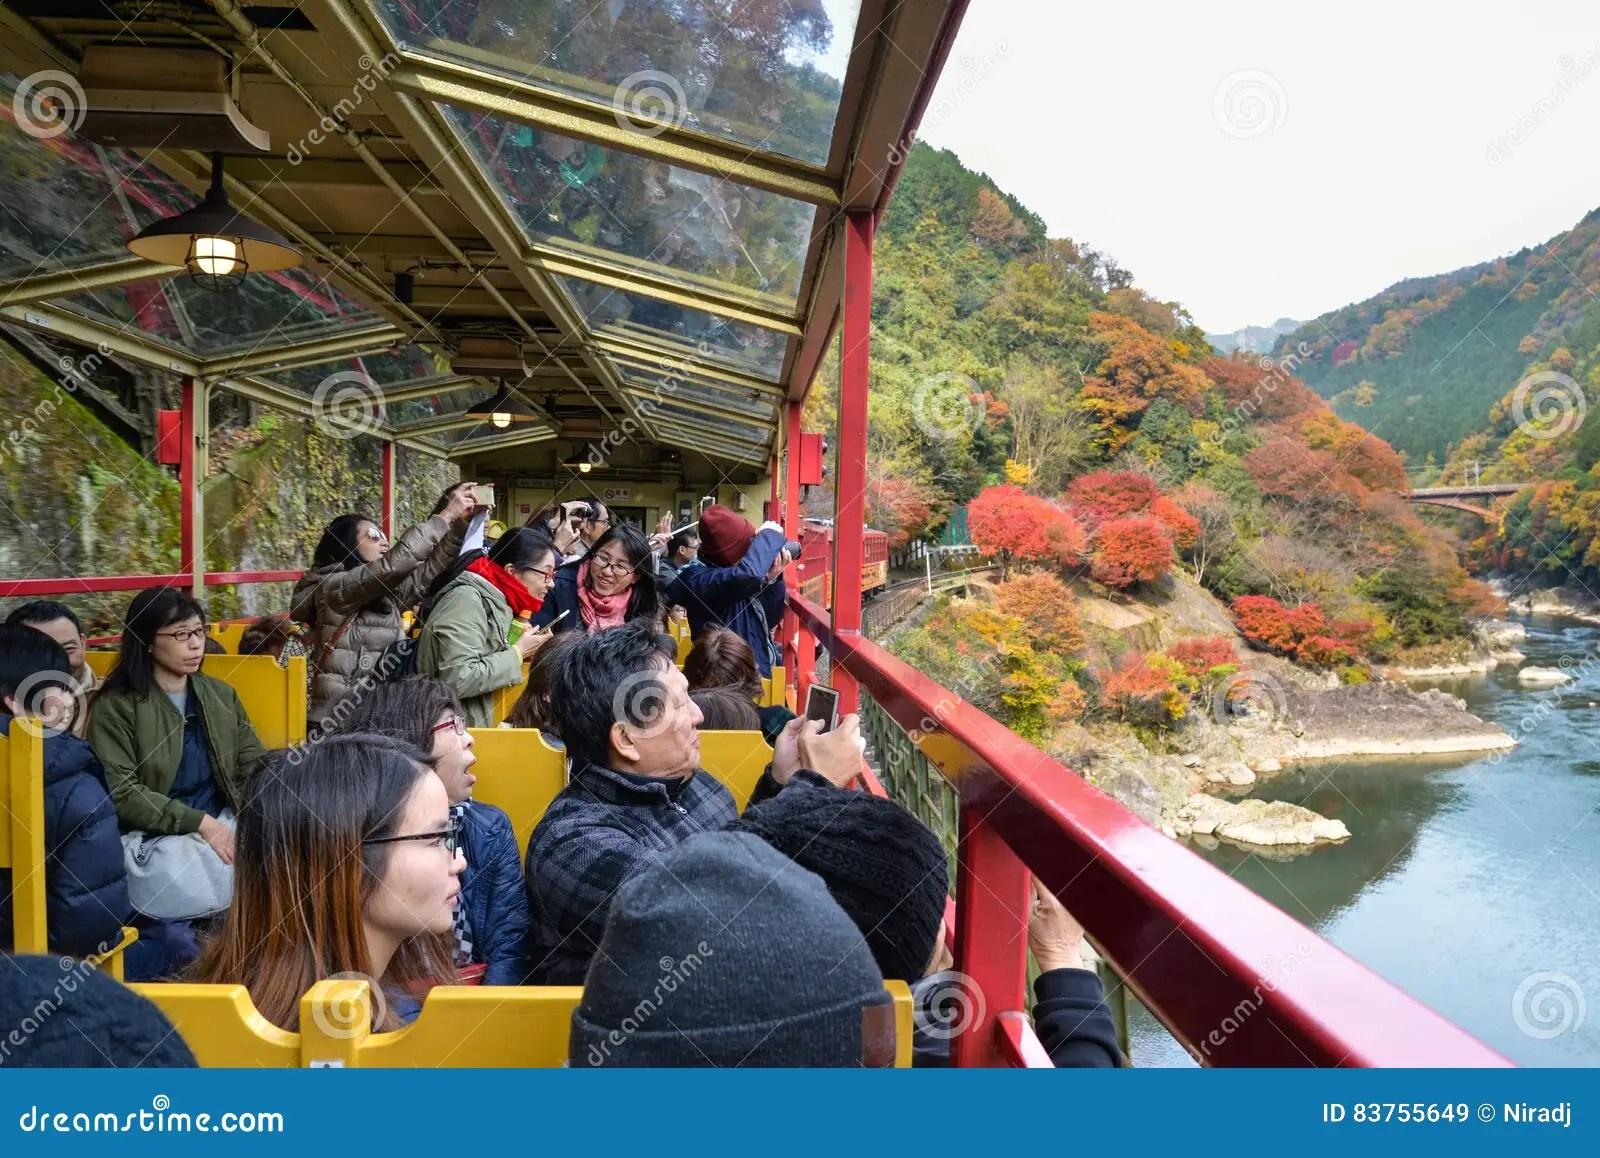 Fall Romance Wallpaper Sagano Romantic Train Kyoto Japan Editorial Stock Image